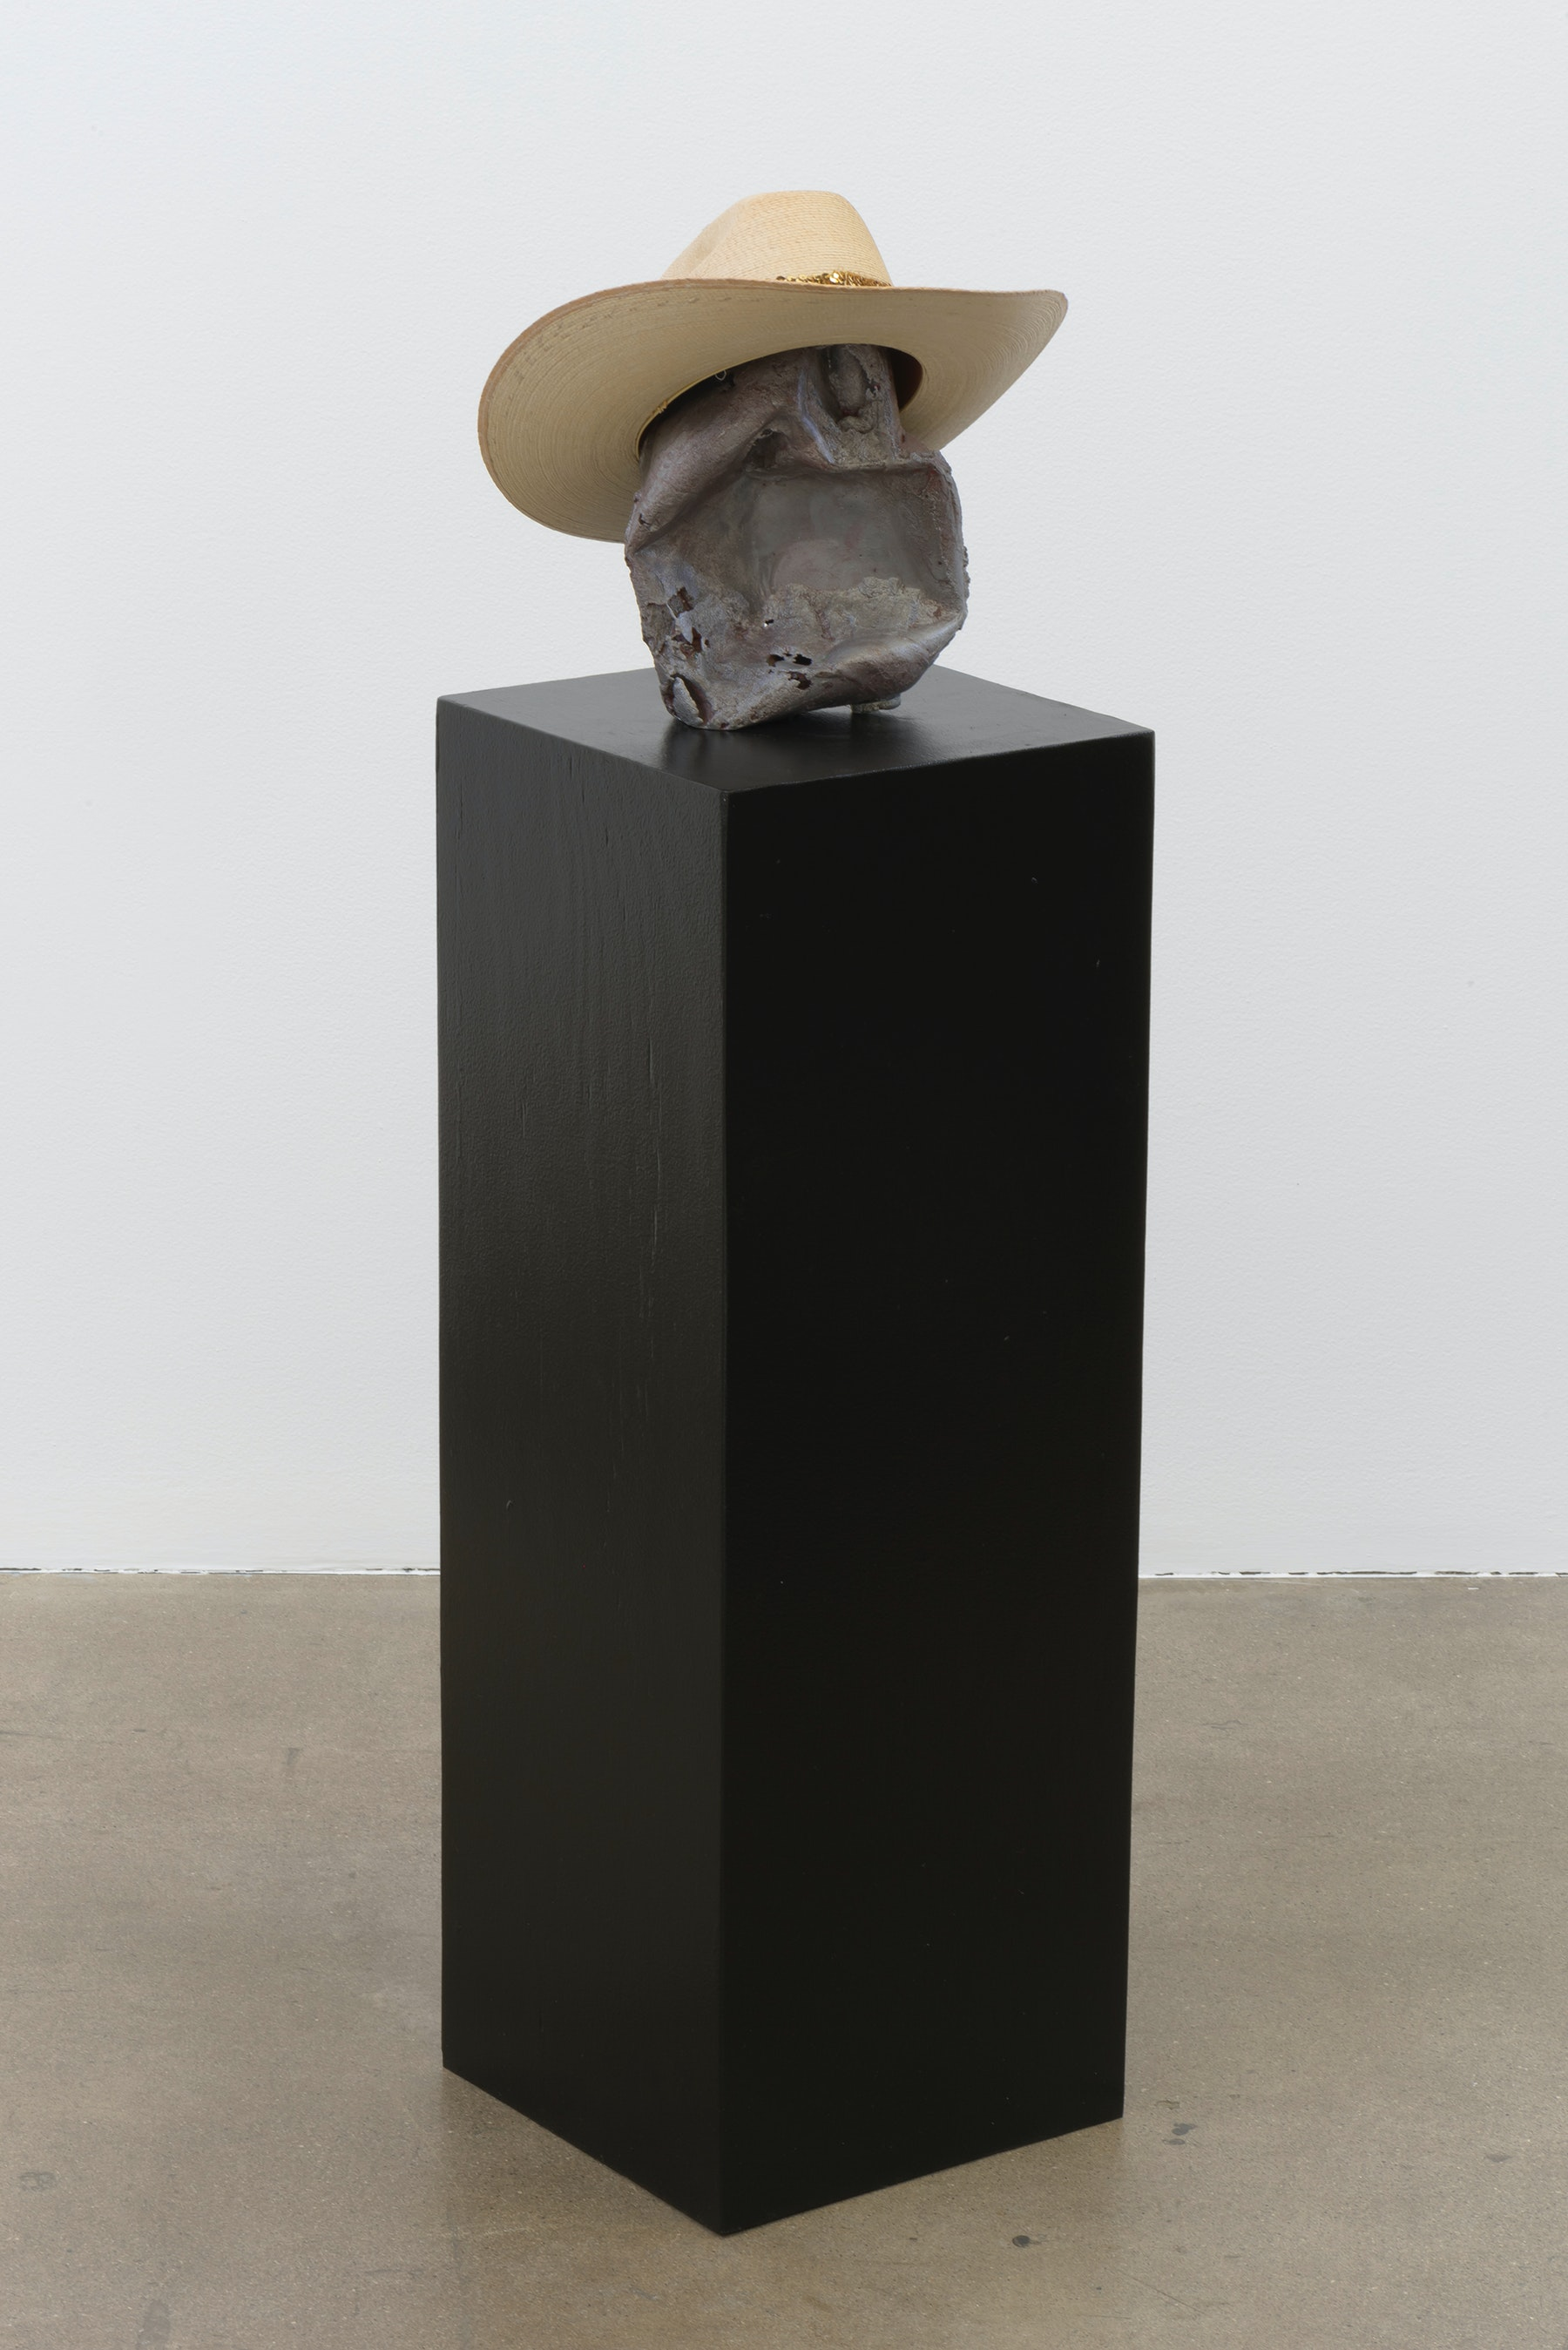 "Edgar Arceneaux ""Red Ronnie,"" 2017 Cast aluminum, enamel, hat, pedestal 48.75 x 12.5 x 12.75"" [HxWxD] (123.83 x 31.75 x 32.39 cm) Inventory #ARC564 Courtesy of the artist and Vielmetter Los Angeles Photo credit: Robert Wedemeyer"